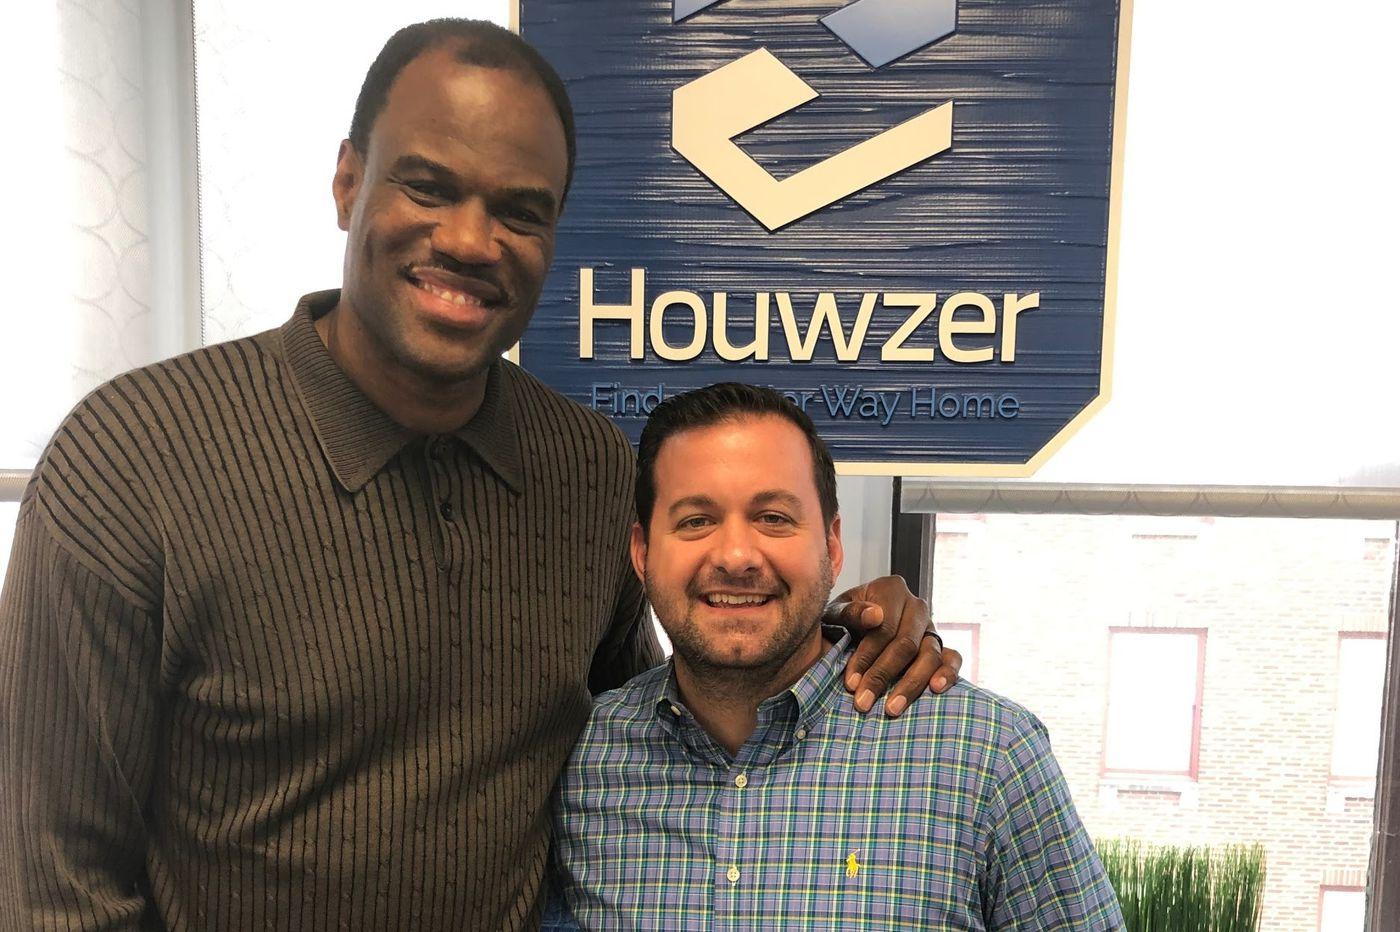 Philly start-up Houwzer draws $4.5M from basketball great David Robinson and local investor Ira Lubert